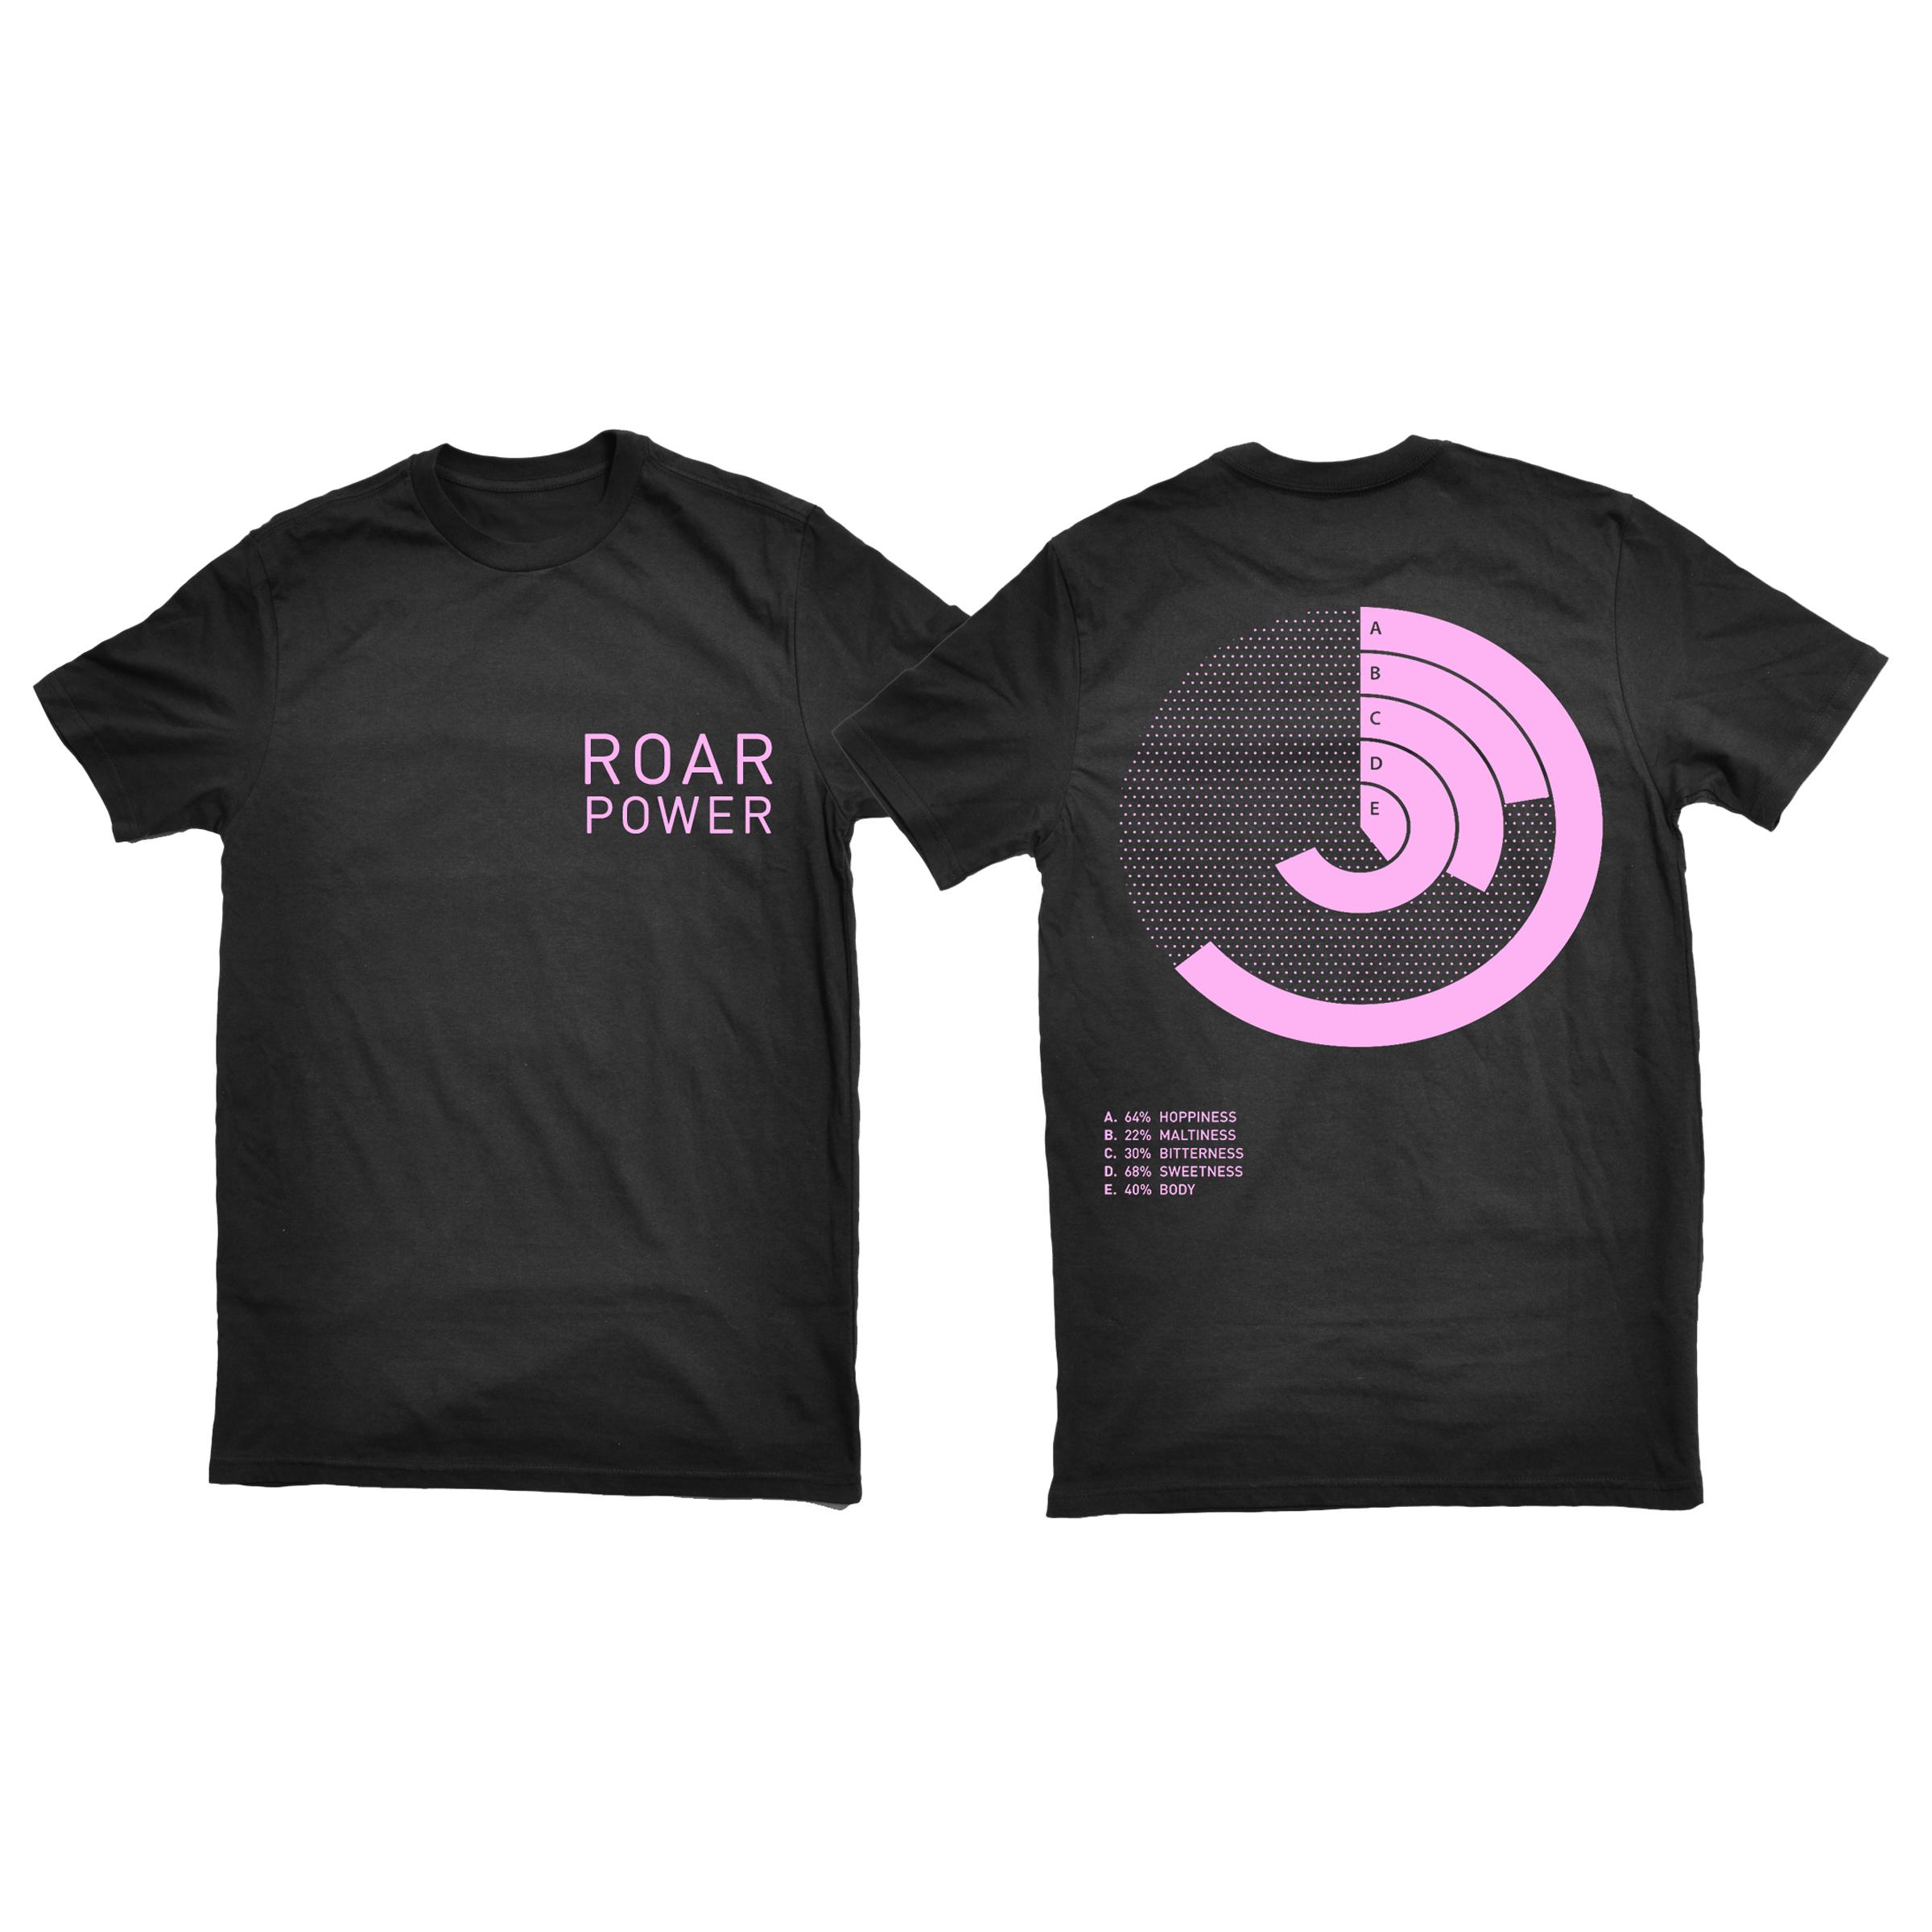 Holy Roar x Good Chemistry shirt